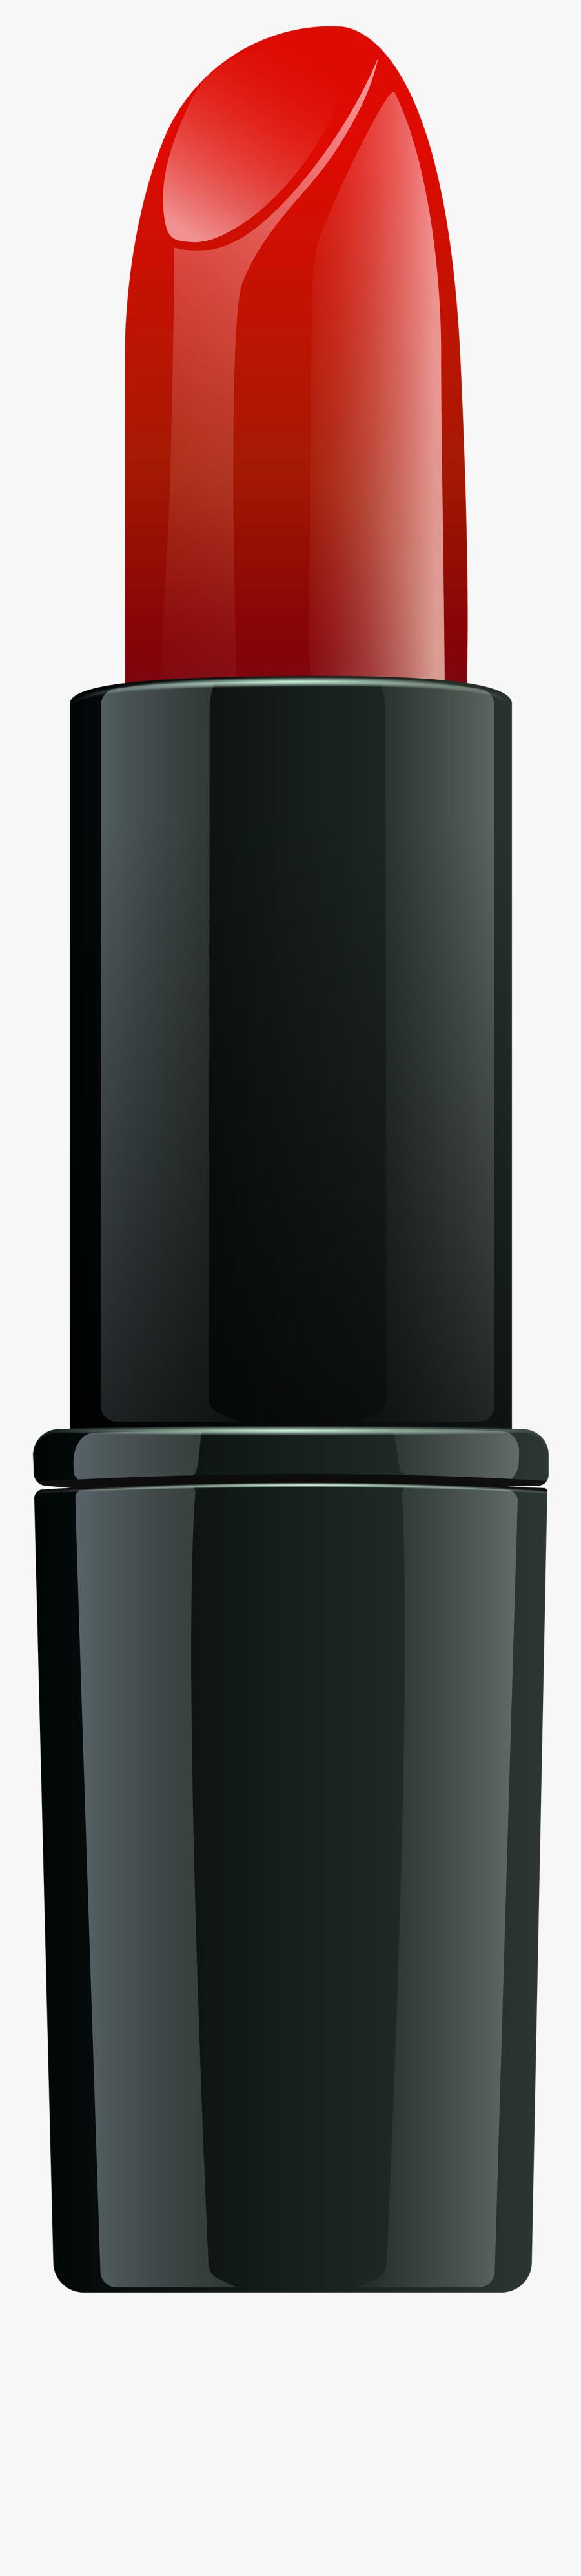 Lipstick Png Transparent Clip Art Image - Red Lipstick Transparent Background, Transparent Clipart